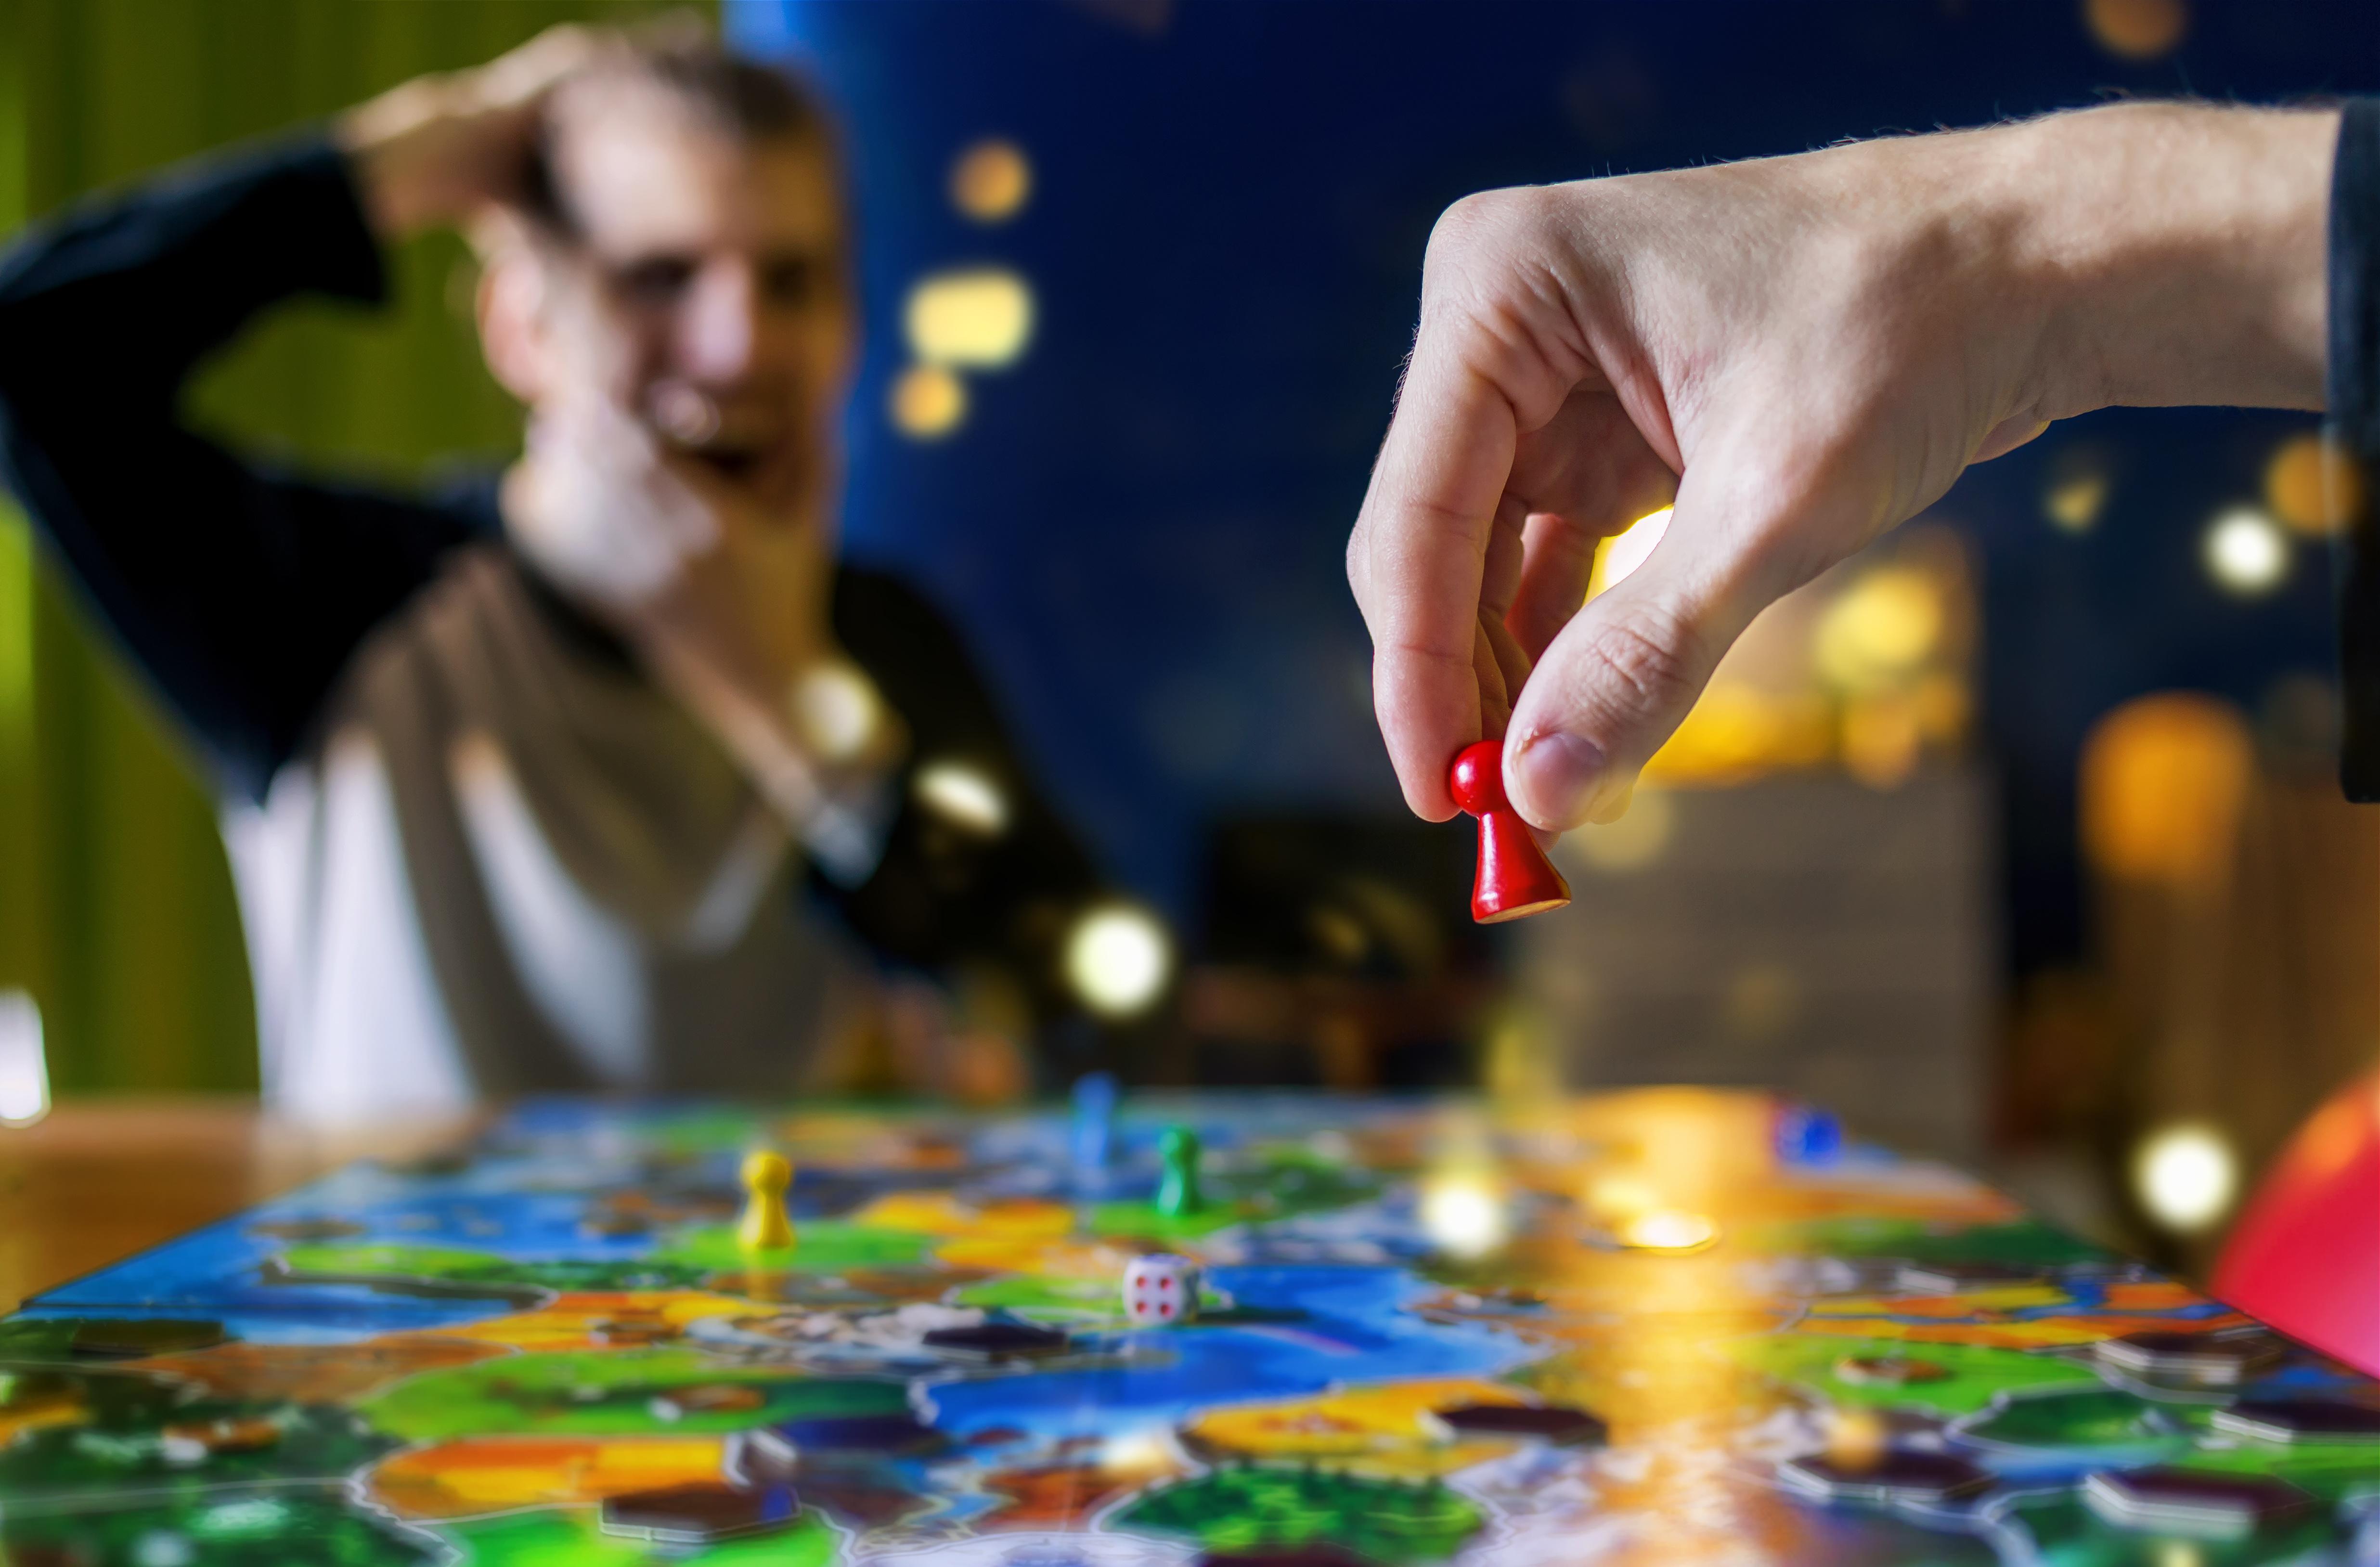 Start-Up entrepreneur board game